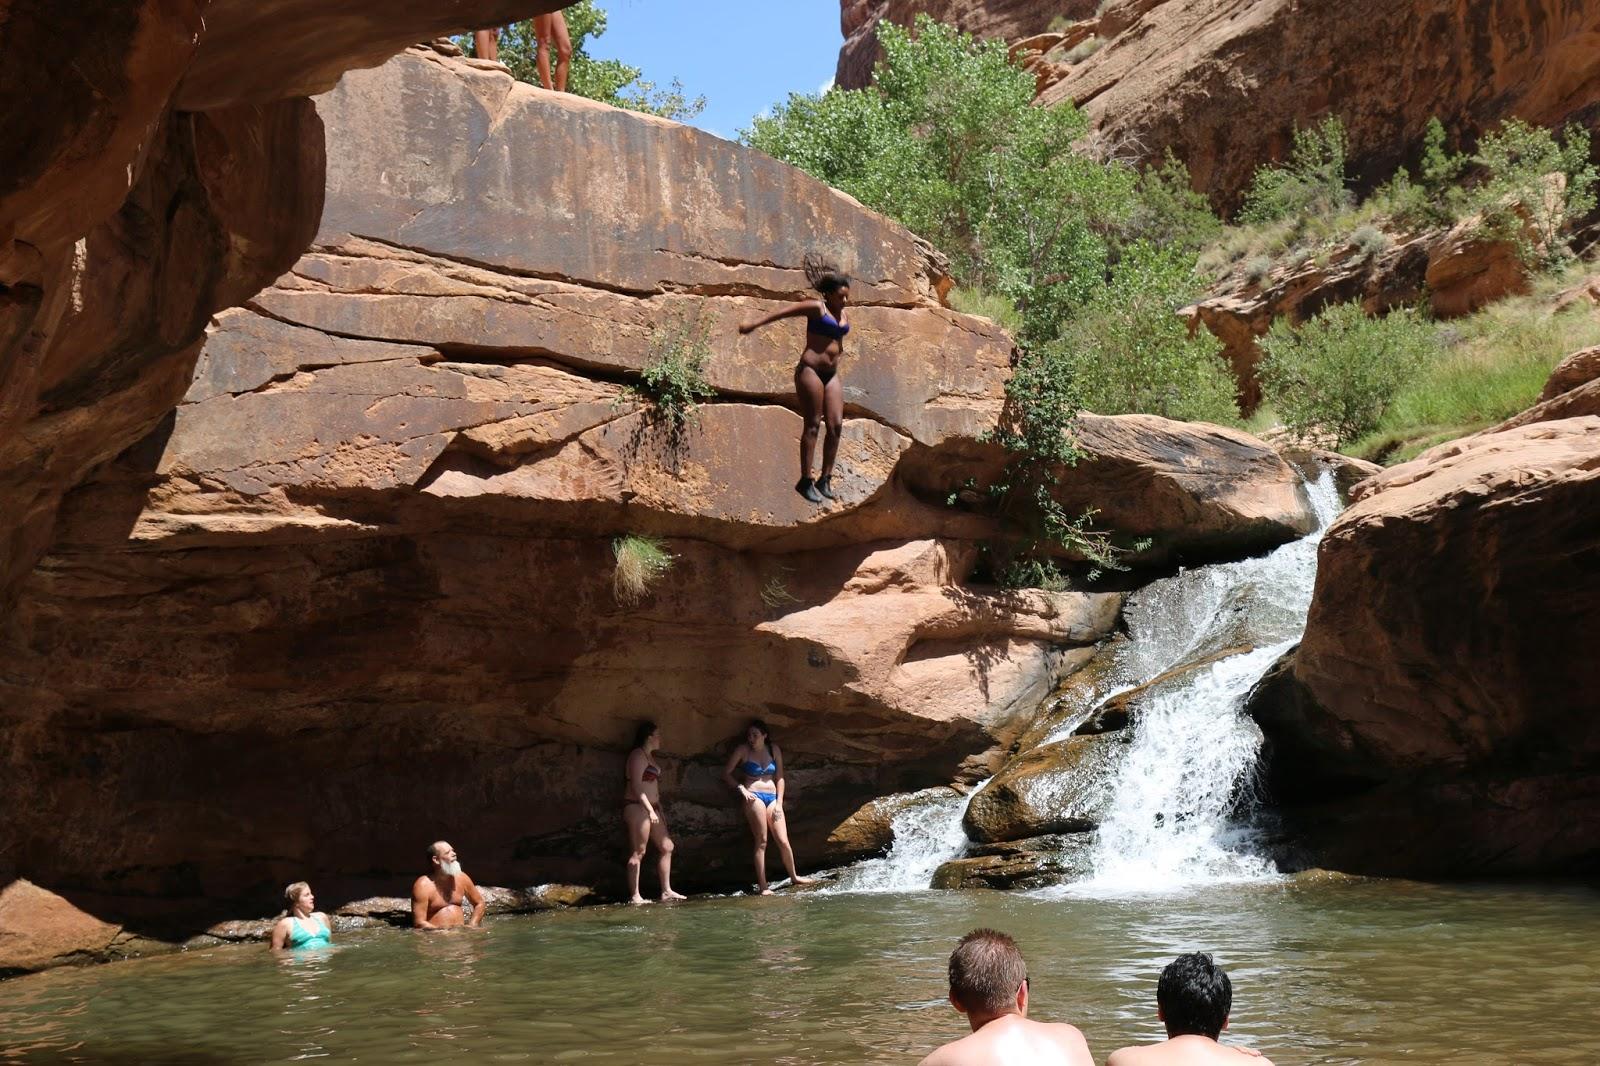 Bridal Veil Falls Mountain Waterfall Friends Hiking In Water Hd 1001 607 Foot Tall Double Cataract Provo Canyon Utah